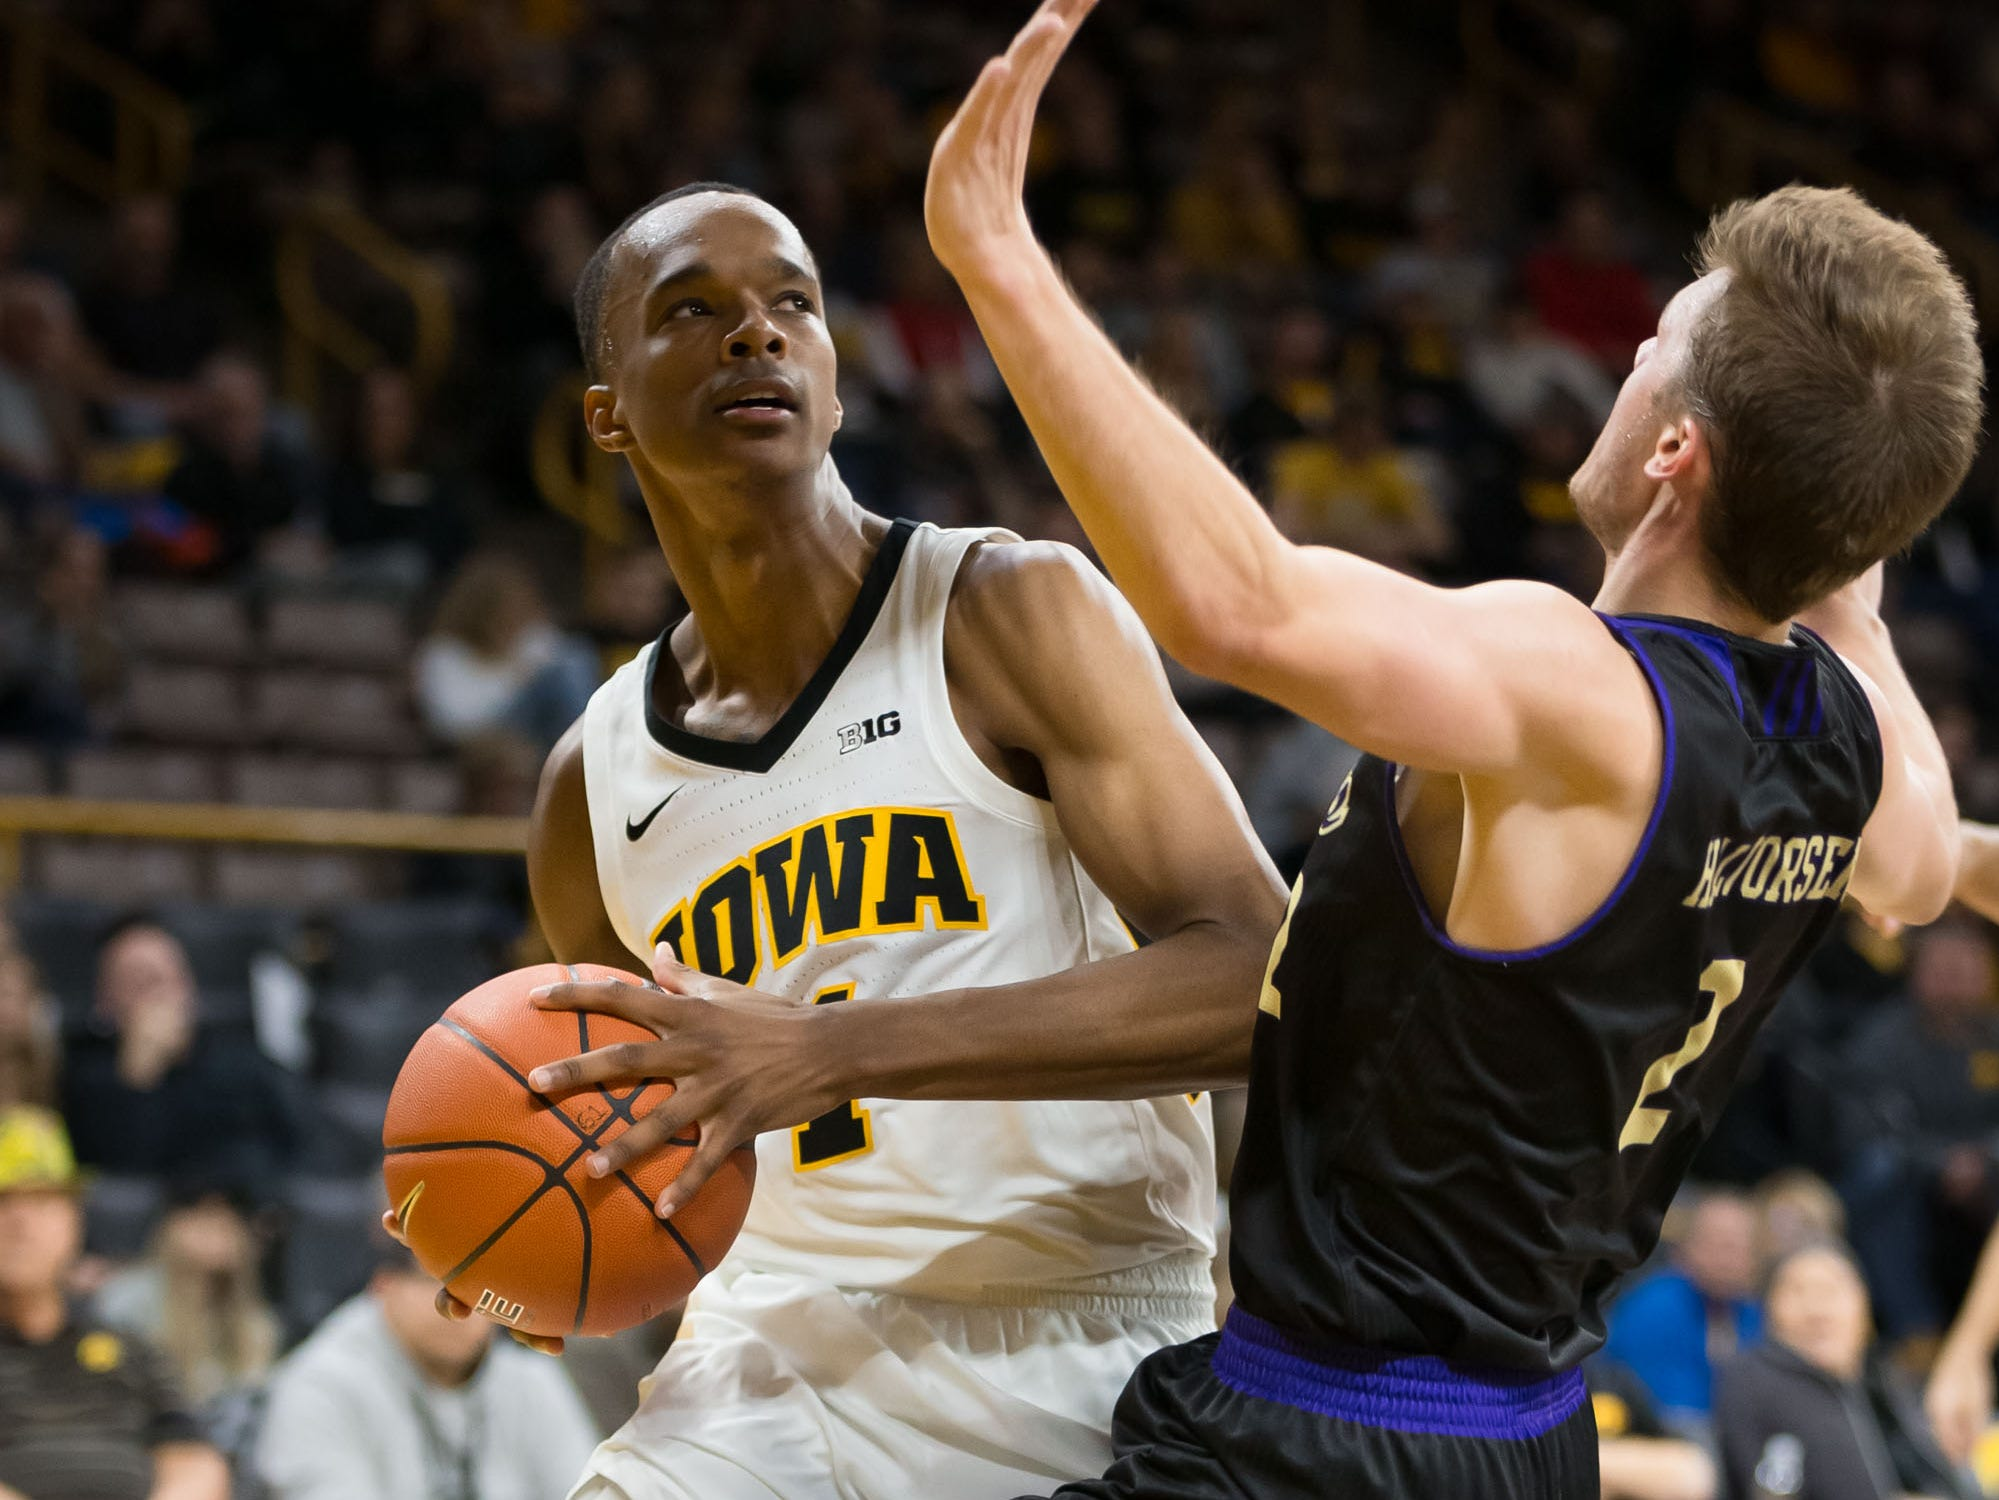 Iowa junior guard Maishe Dailey (1) bumps into Western Carolina sophomore guard Matt Halvorsen (2) in the second half at Carver Hawkeye Arena in Iowa City on Tuesday, Dec. 18, 2018.